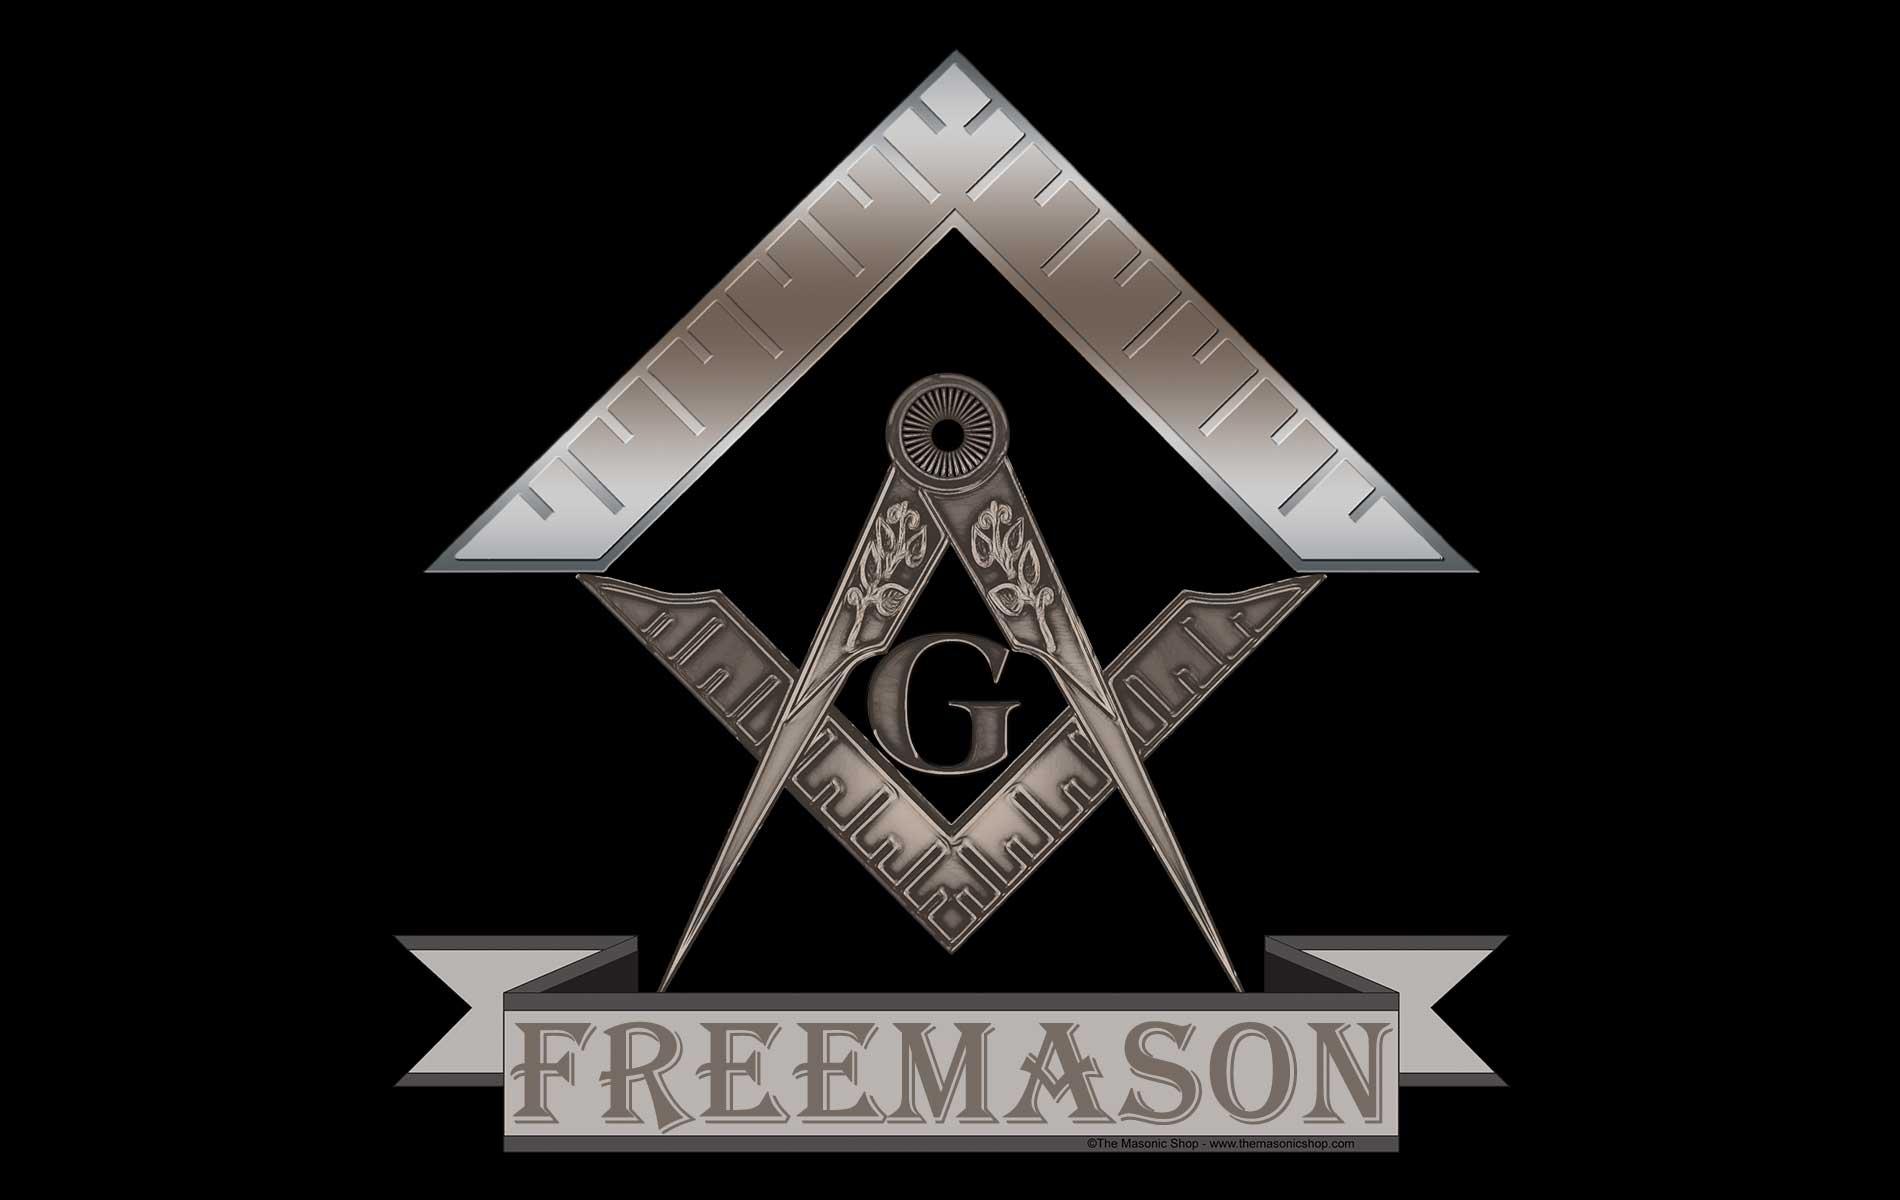 Masonic Wallpaper Courtesy of The Masonic Shop Page Seven 1900x1200